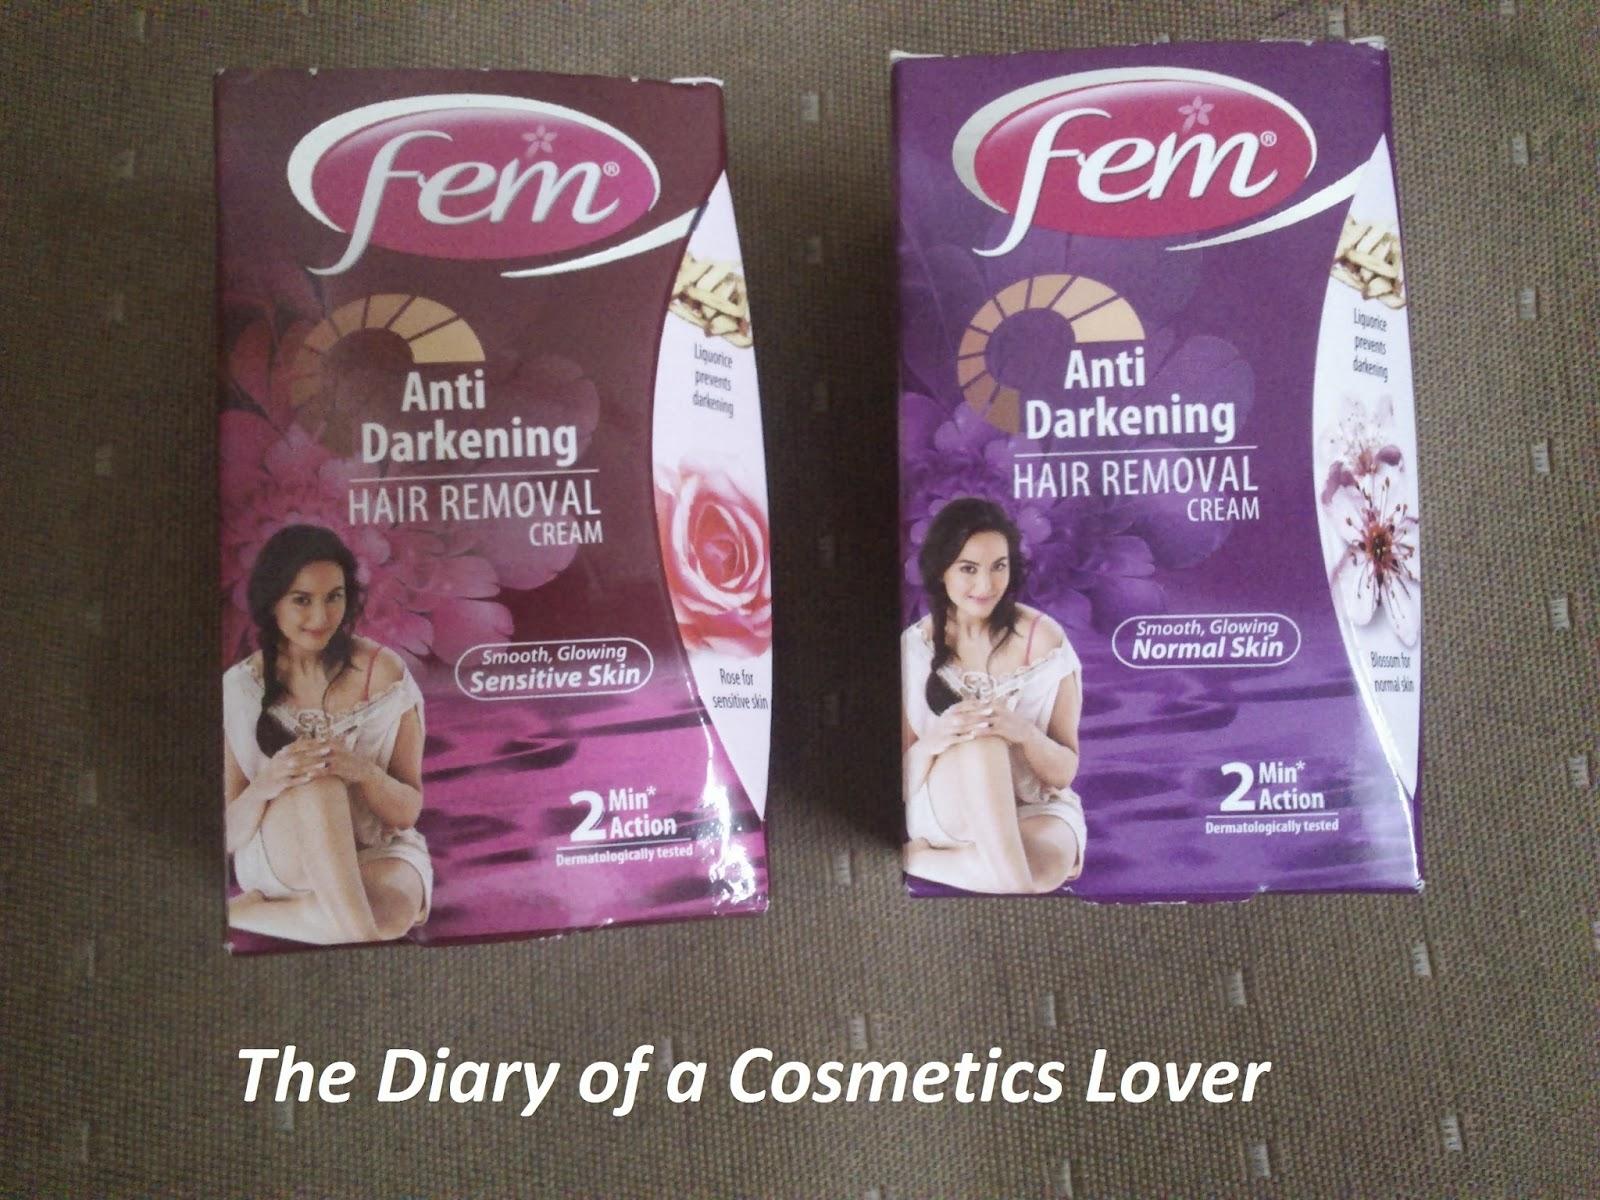 The Beauty Diaries Fem Anti Darkening Hair Removal Cream Review